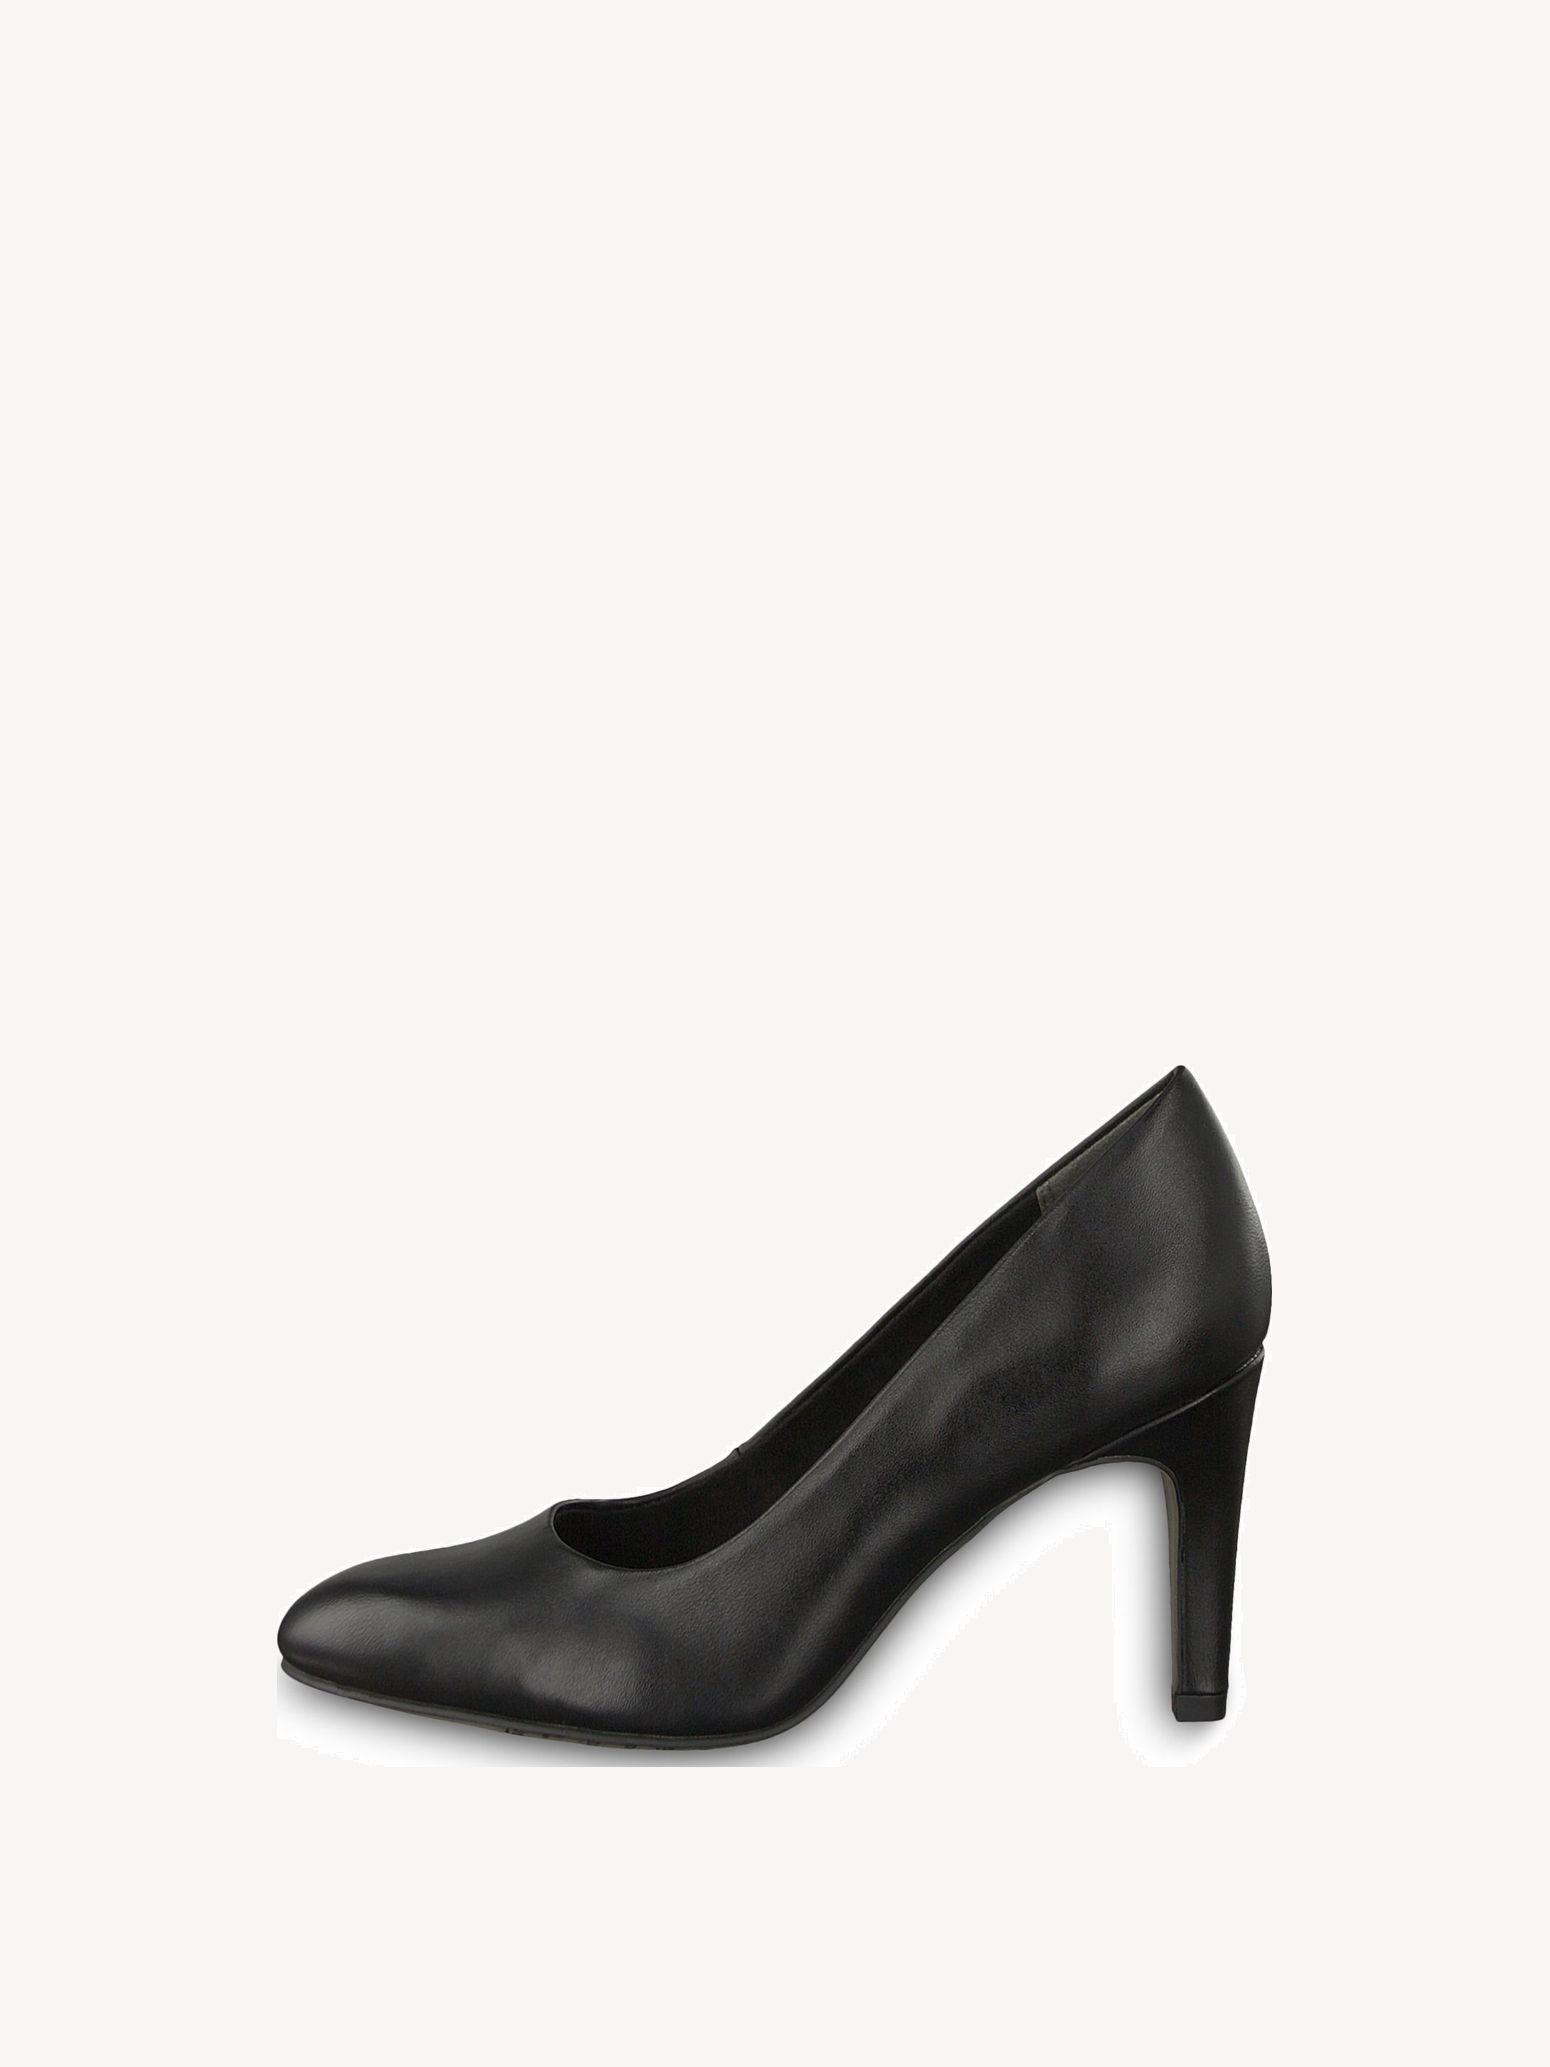 Tamaris | Shishashoes! in 2019 | Pumps, Heels, Slippers